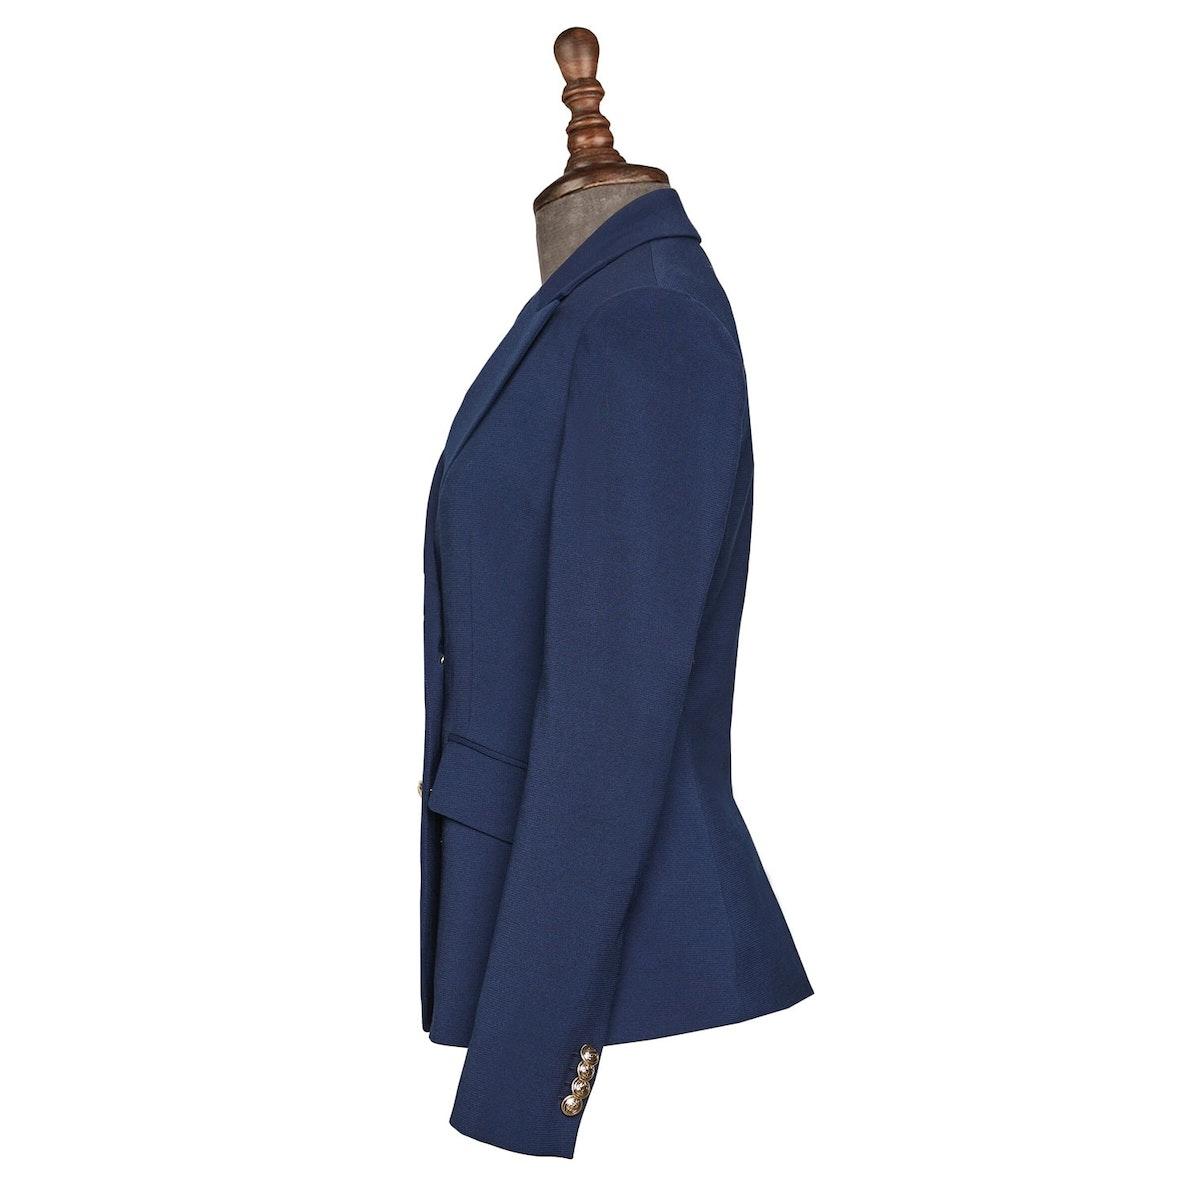 InStitchu Collection The Portsea Navy Jacket